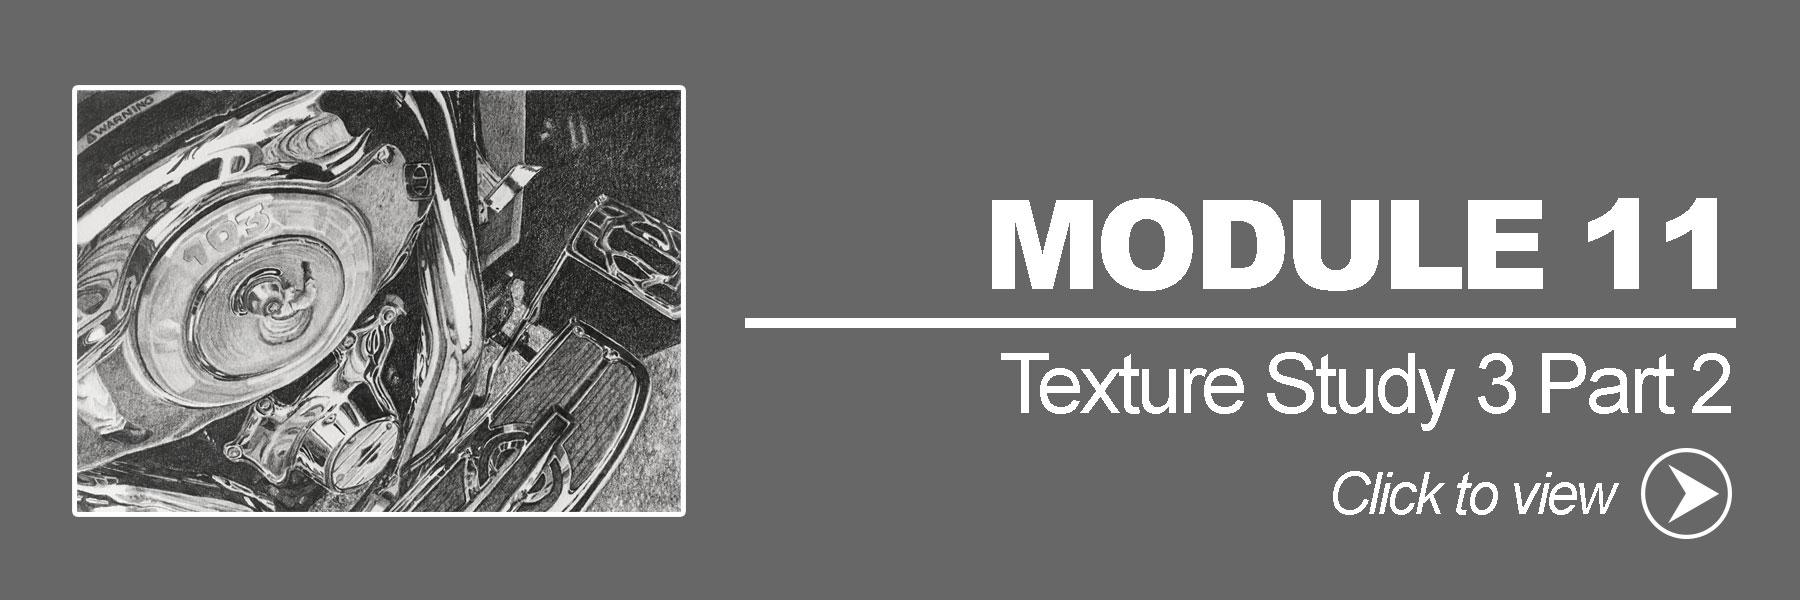 Texture Study 3 Part 2